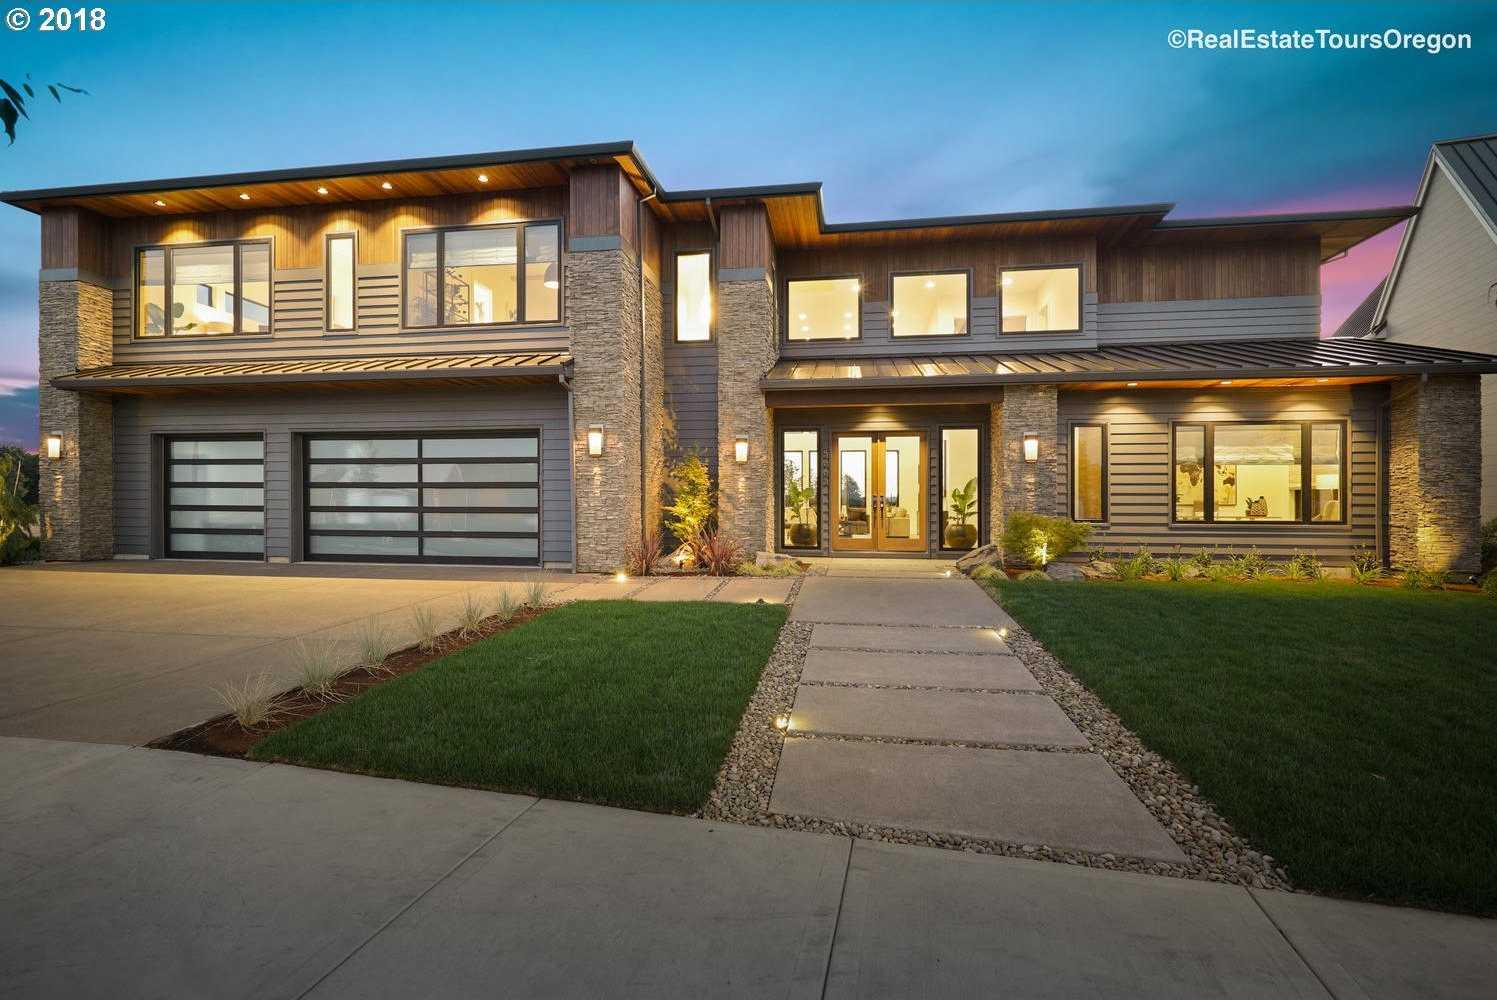 $1,970,000 - 4Br/5Ba -  for Sale in Hillsboro